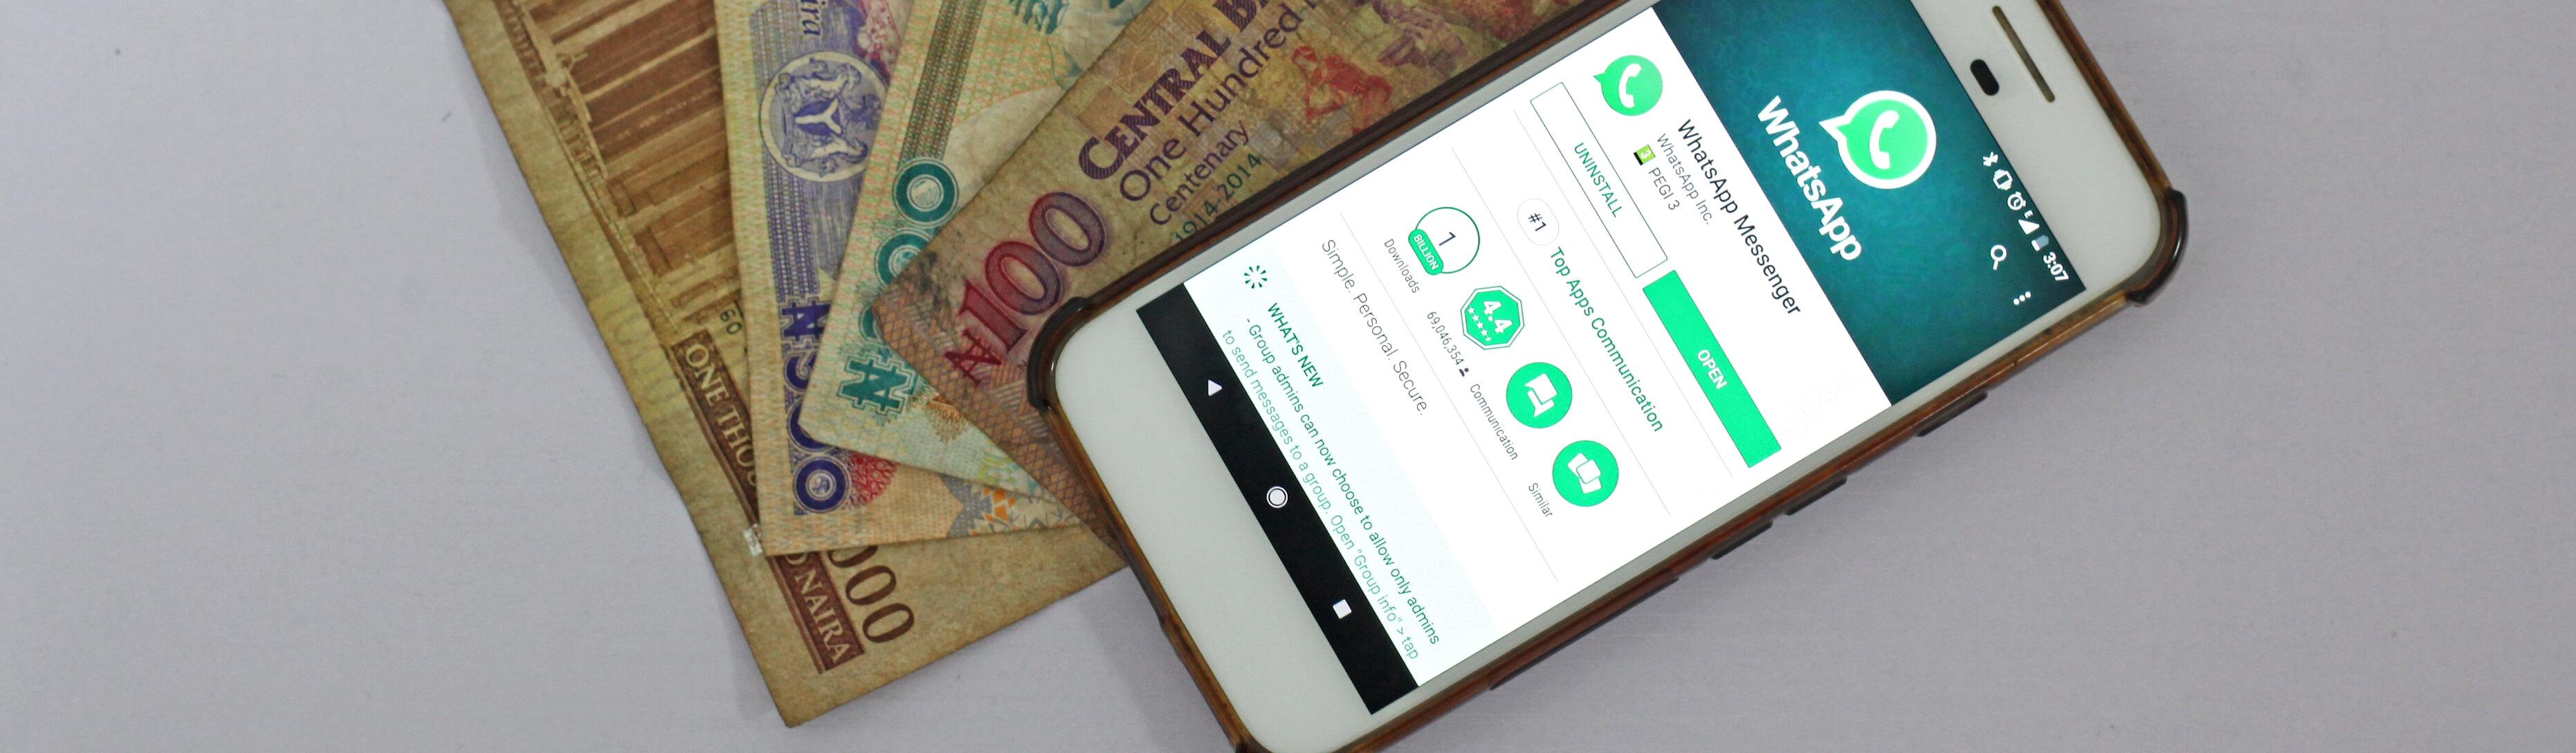 Whatsapp Pay Phone